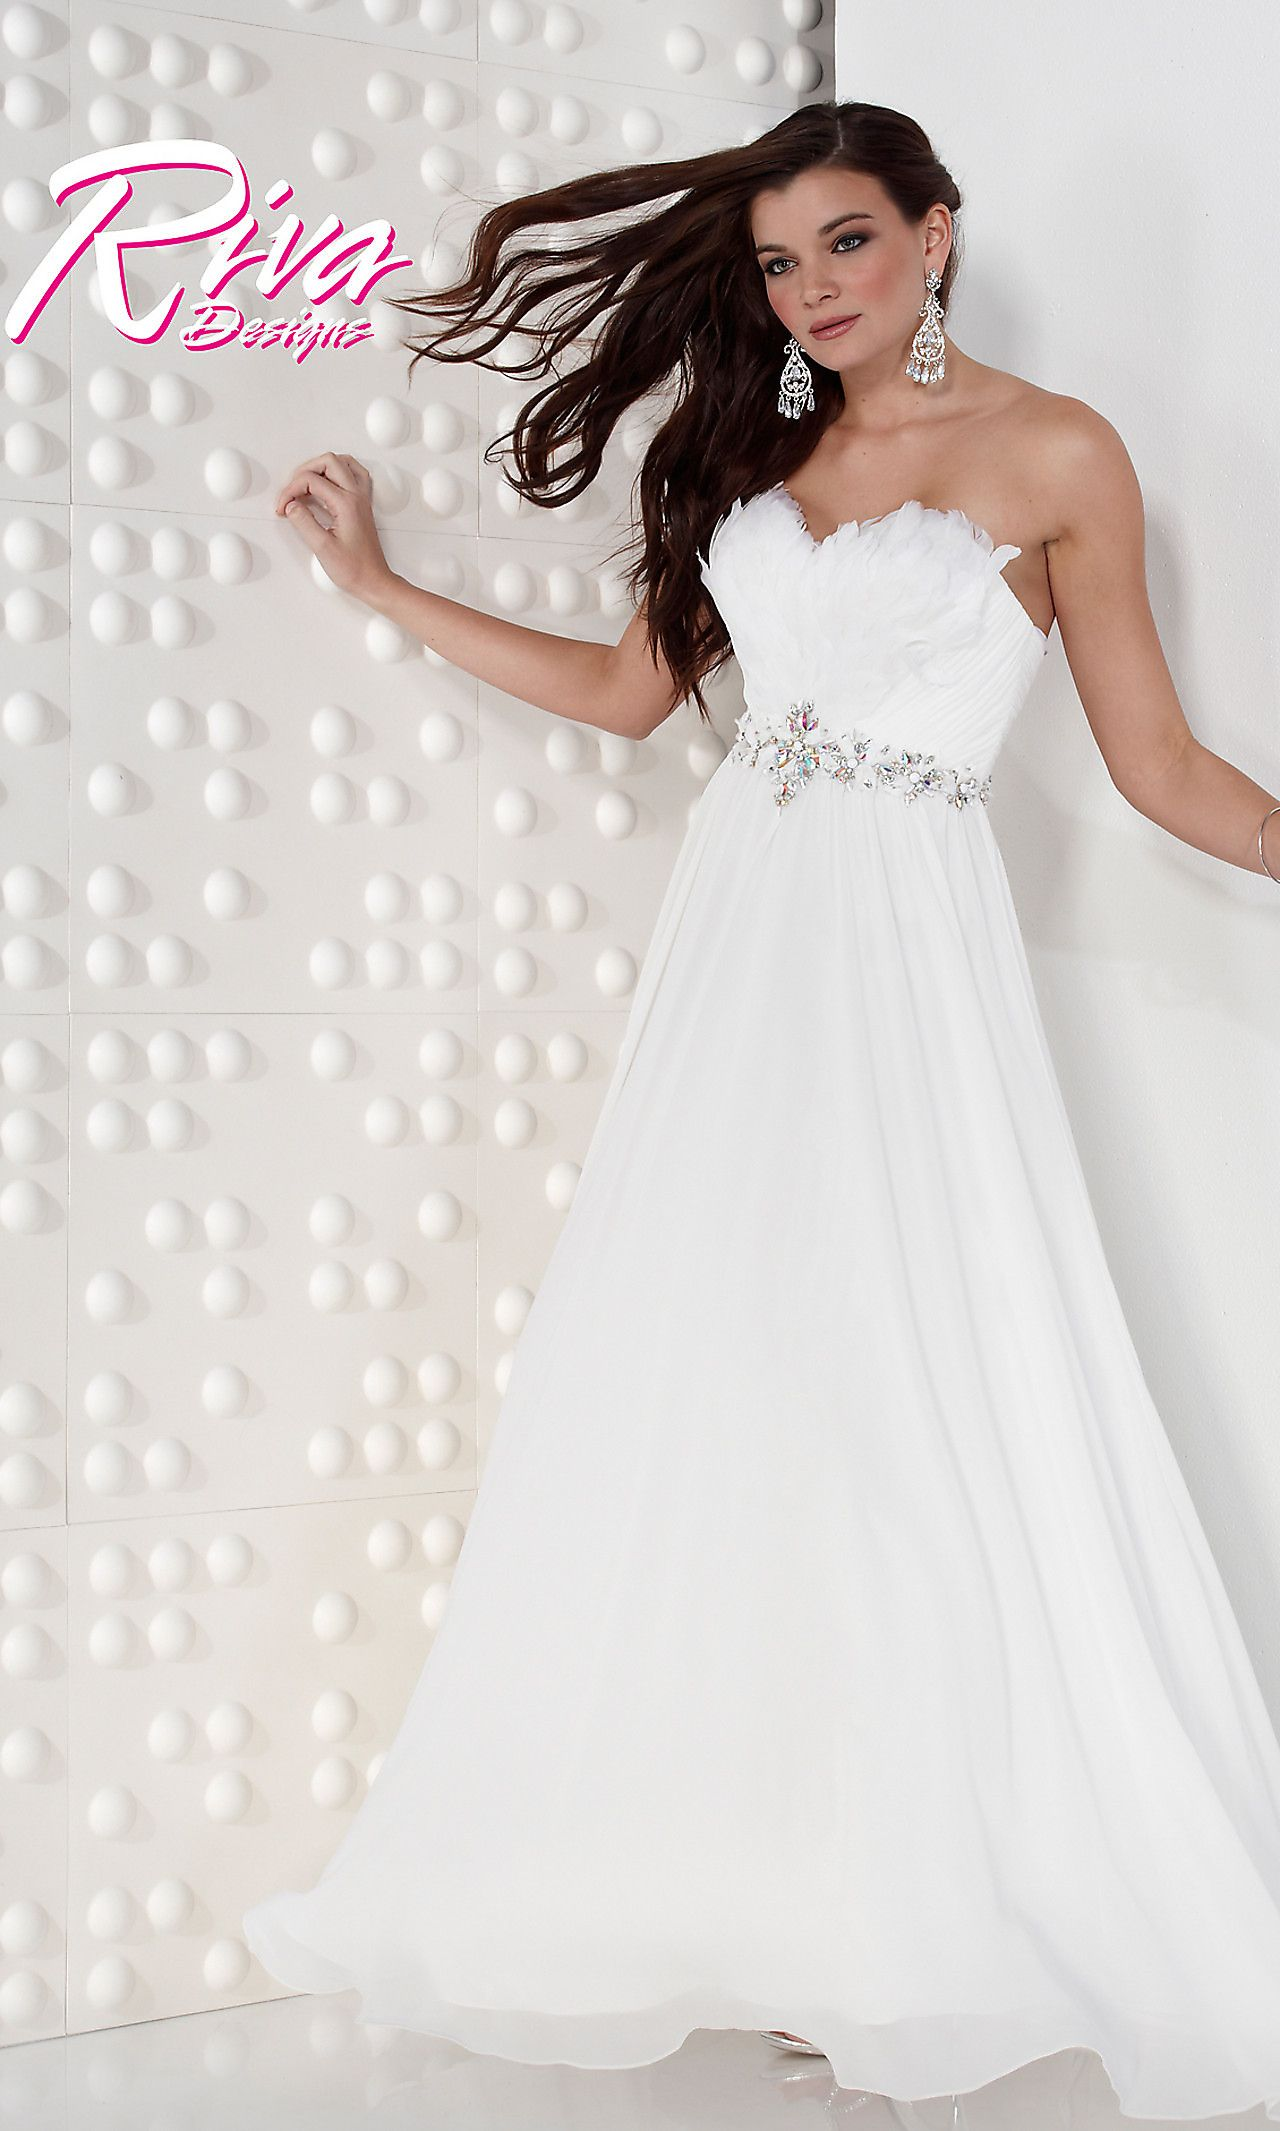 Pin by jennifer heintz on wedding ideas pinterest gowns and weddings